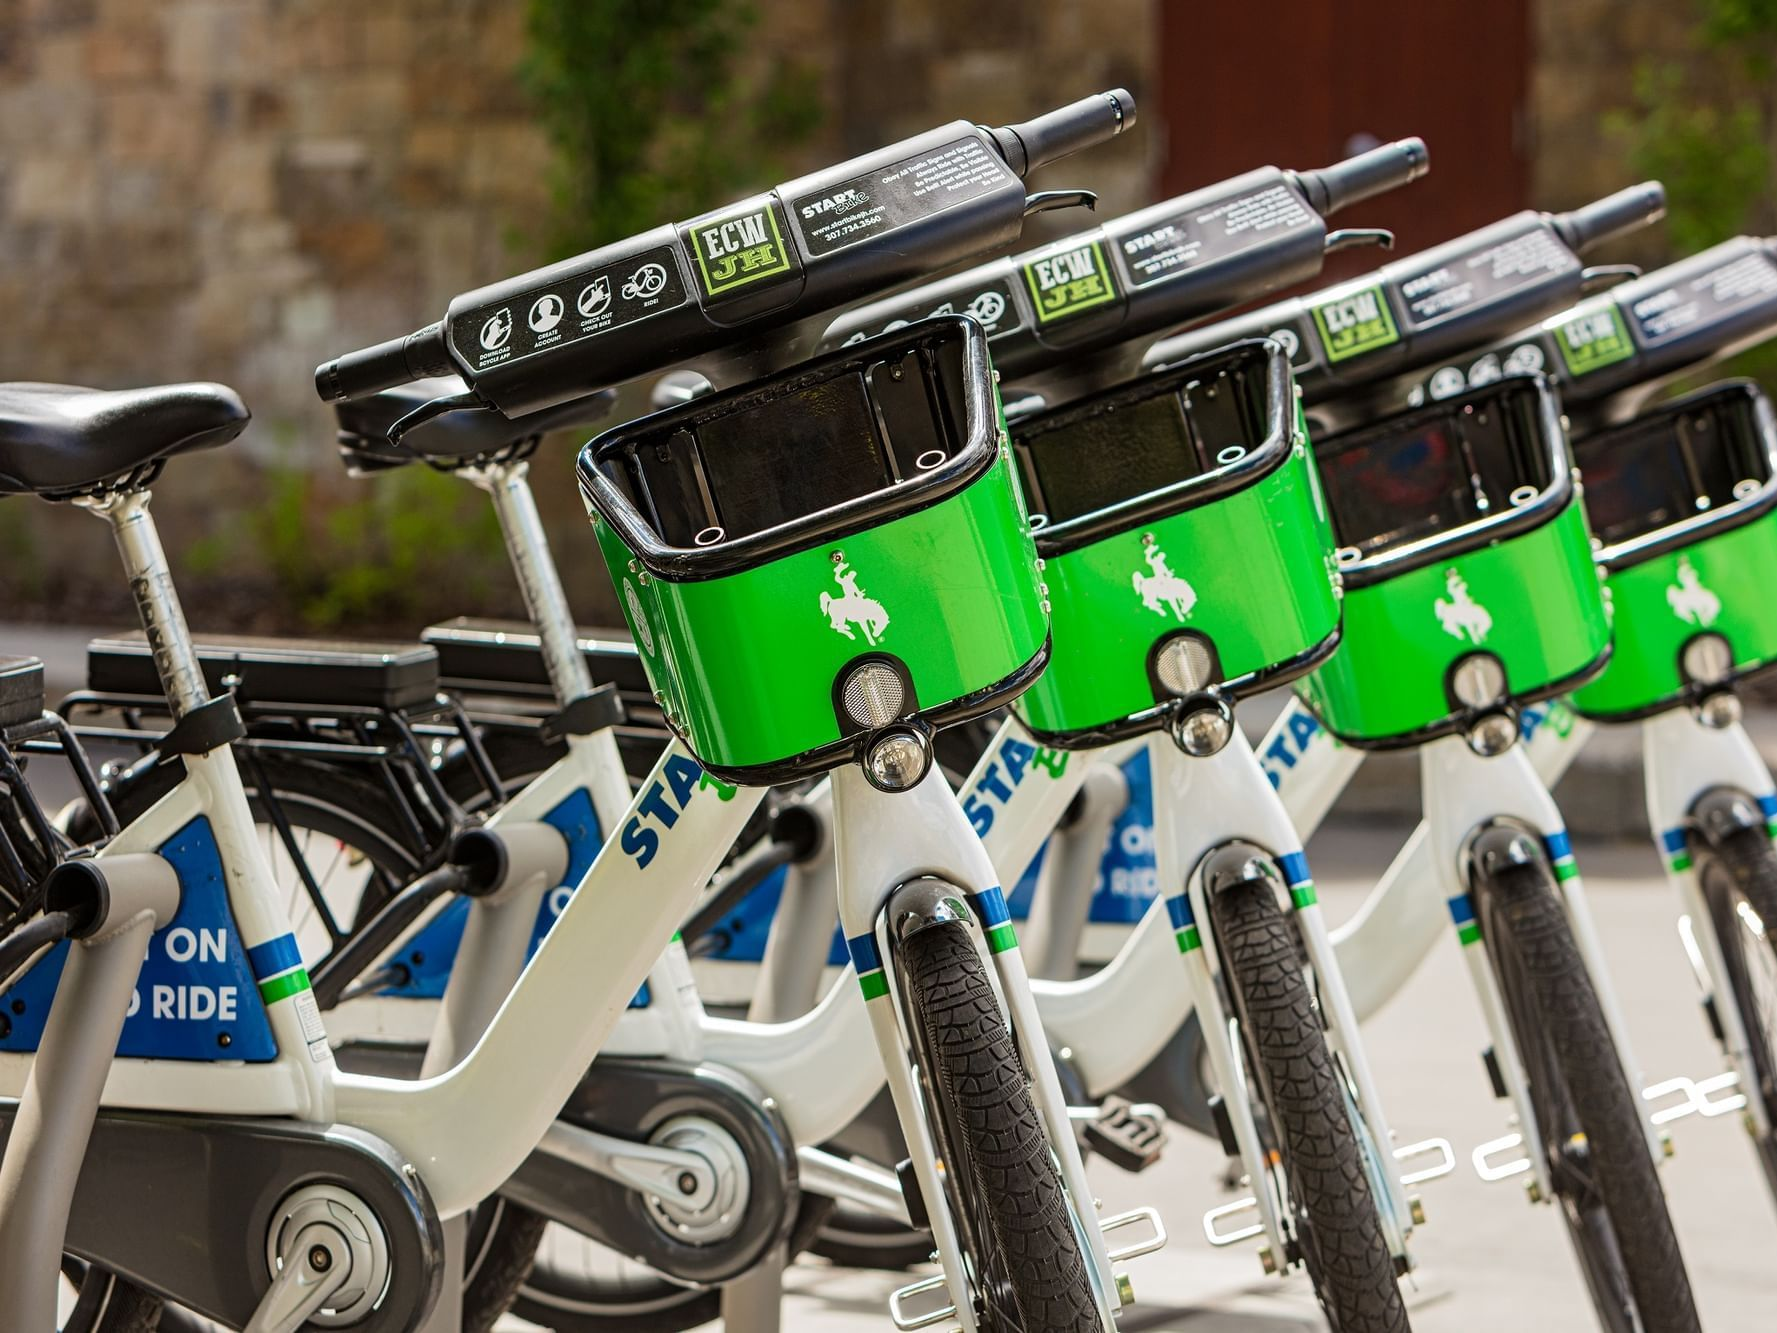 Start bike rentals at the Wyoming Inn